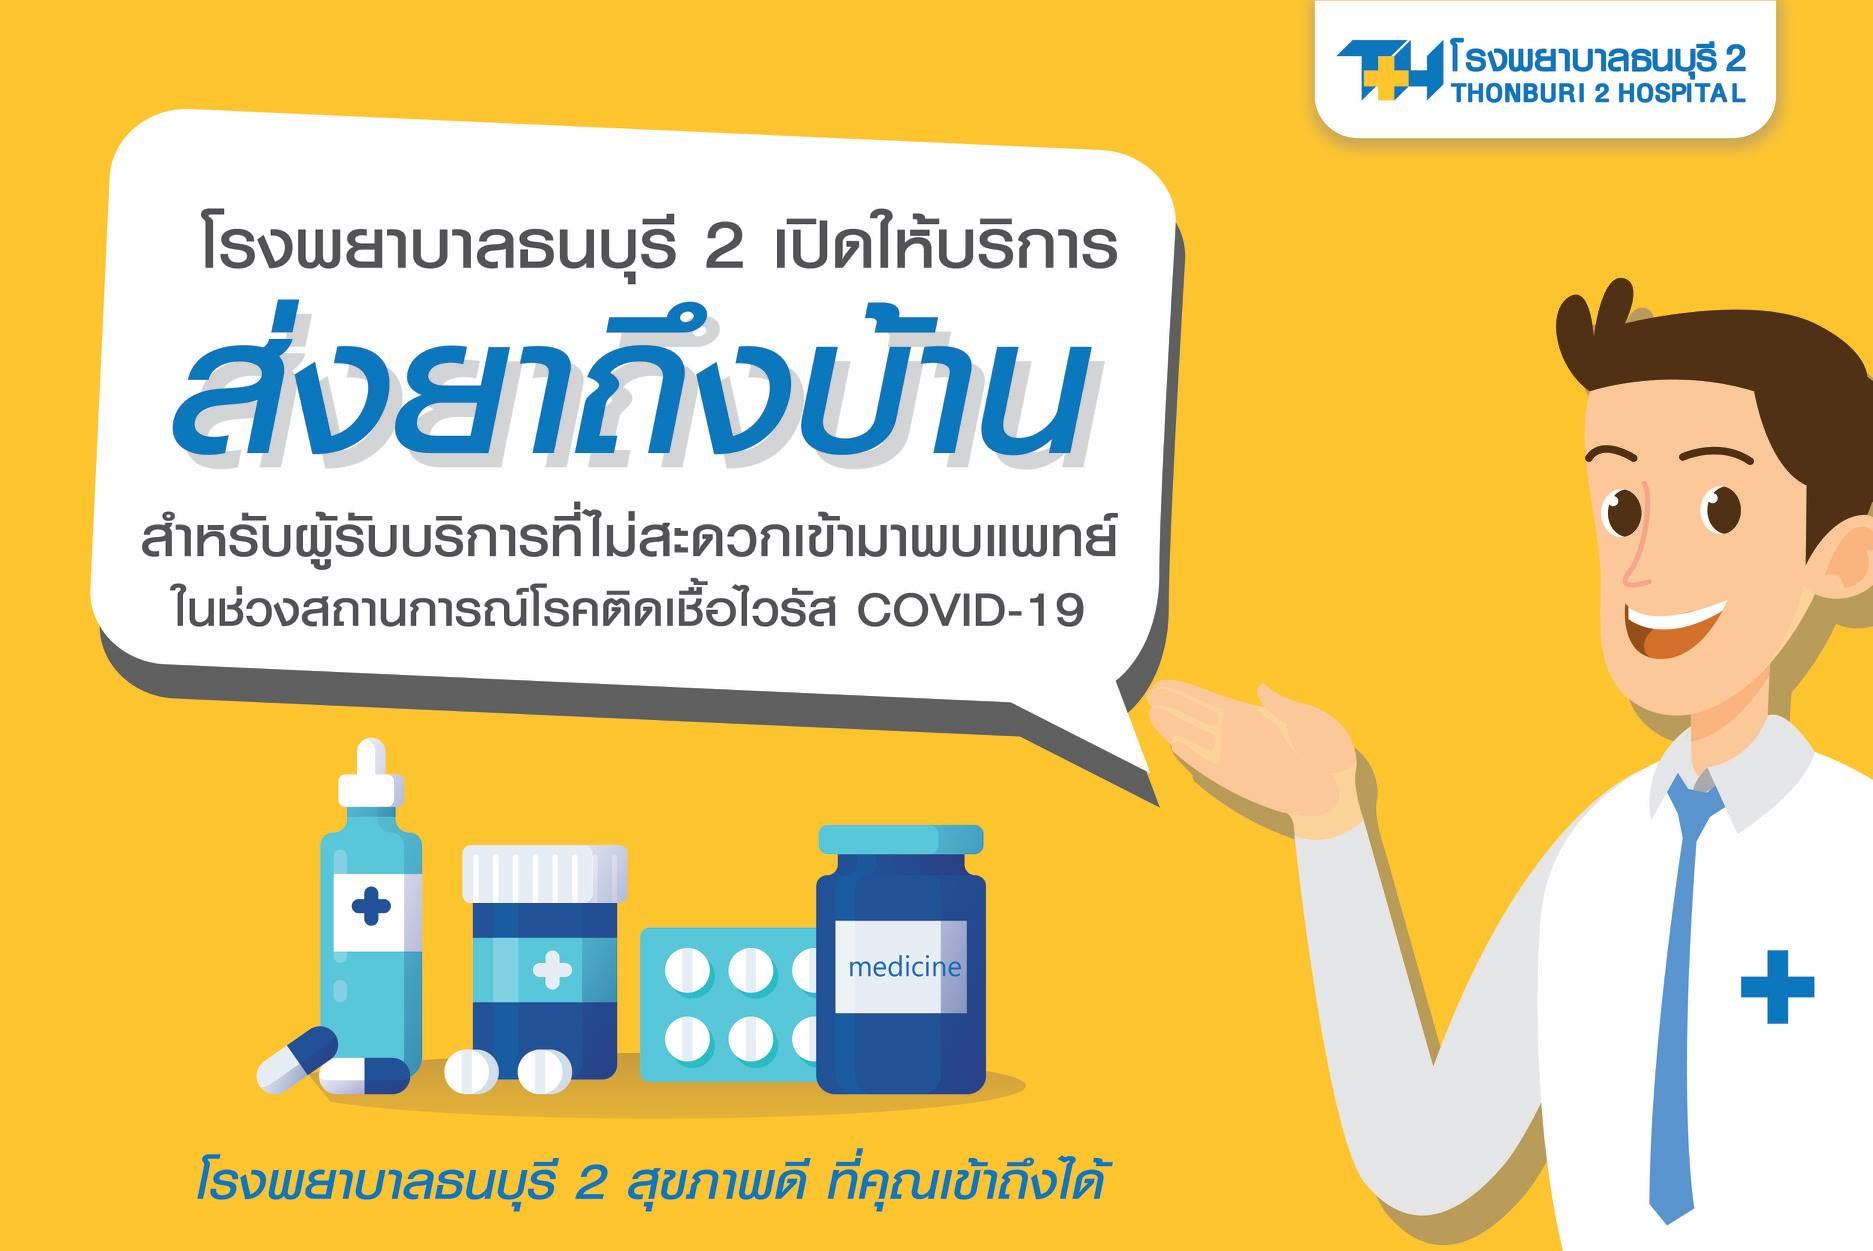 Thonburi2 Hospital โรงพยาบาลธนบุรี2